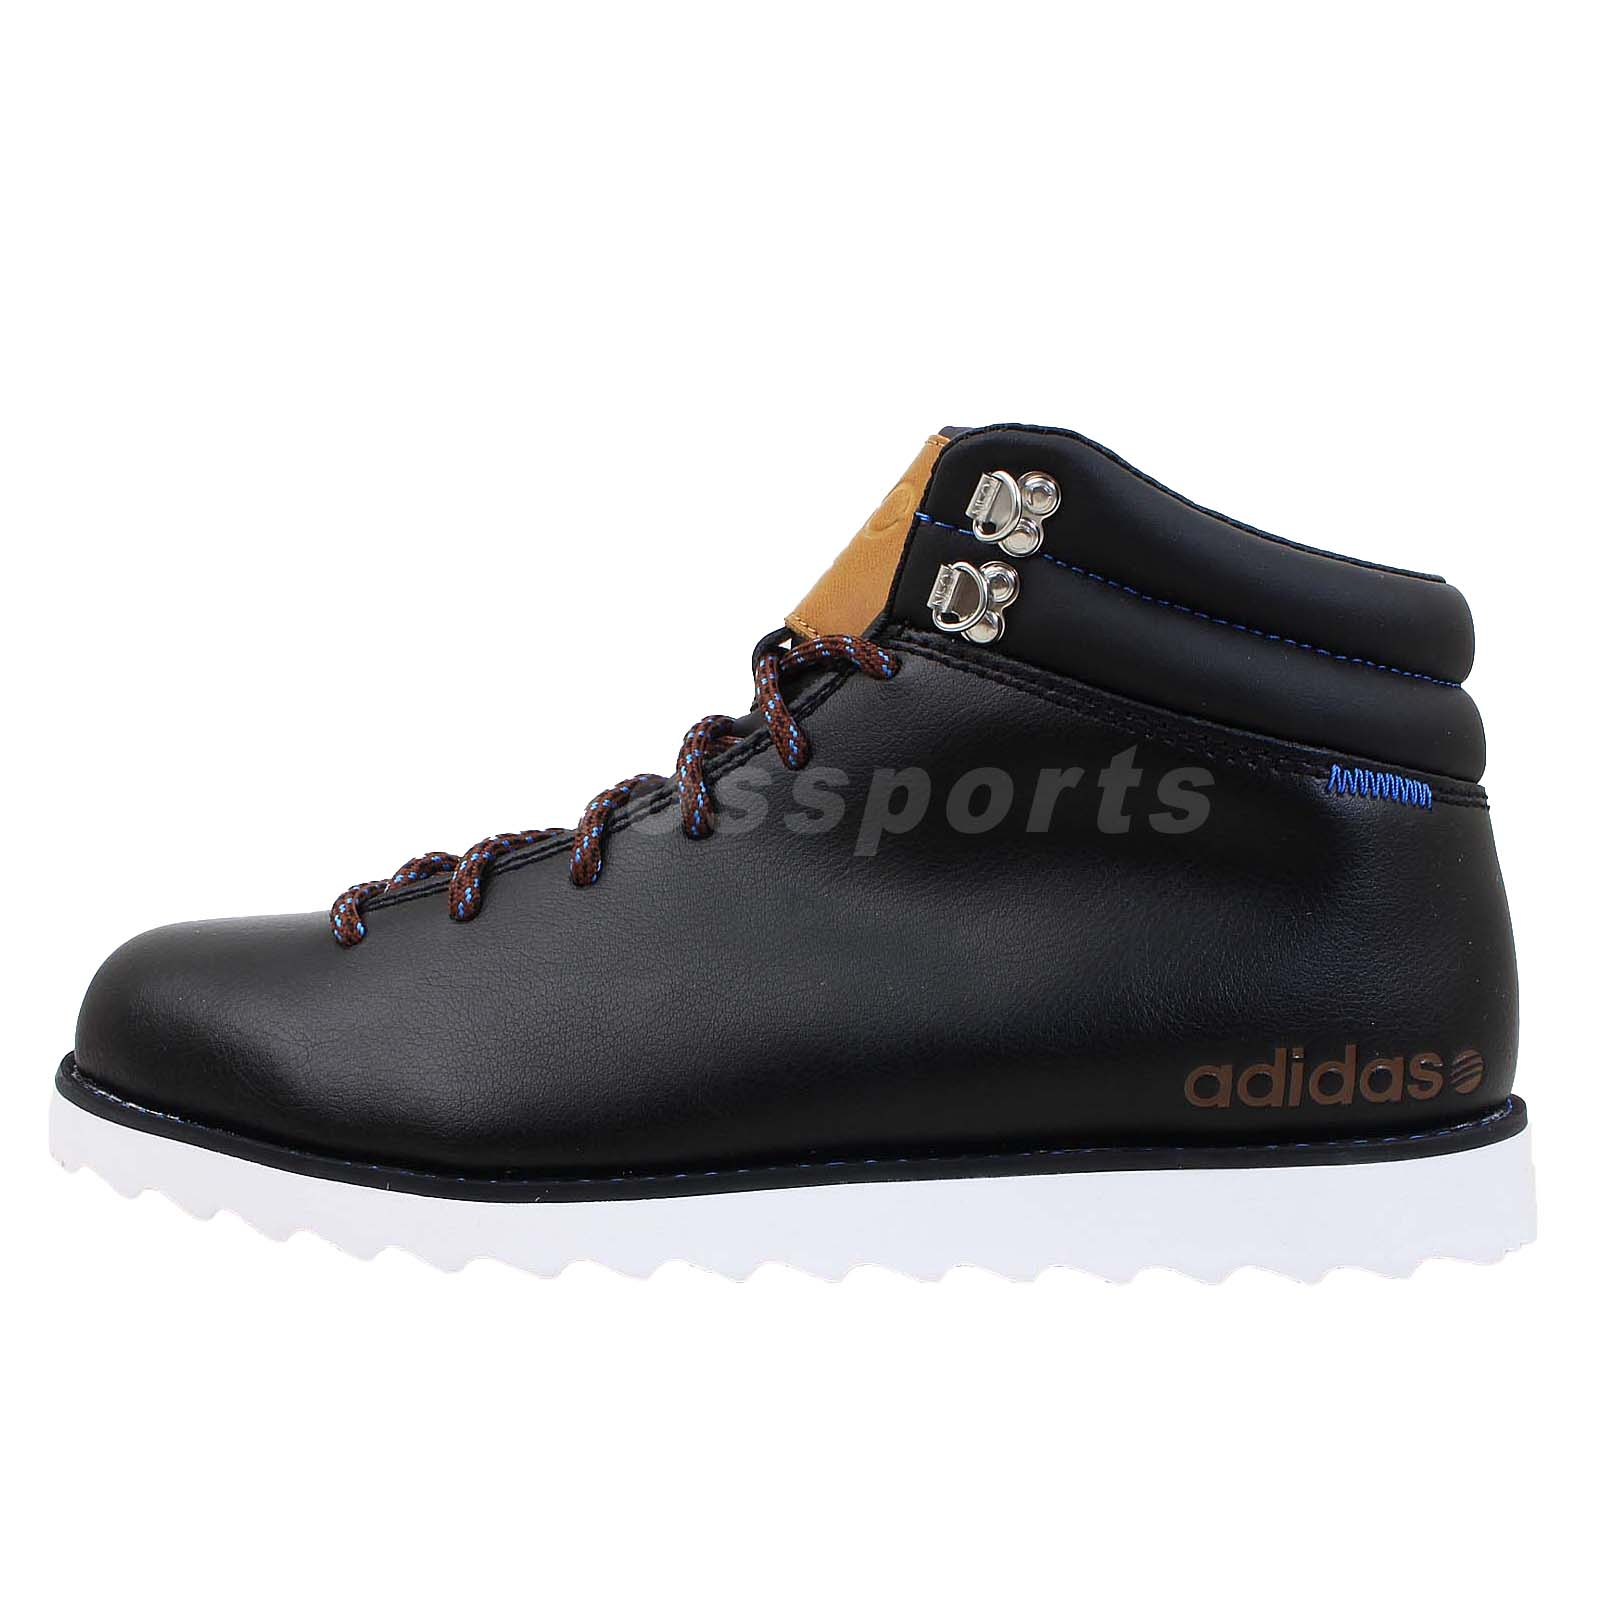 adidas seneo rugged neo 2013 mens casual shoes fashion